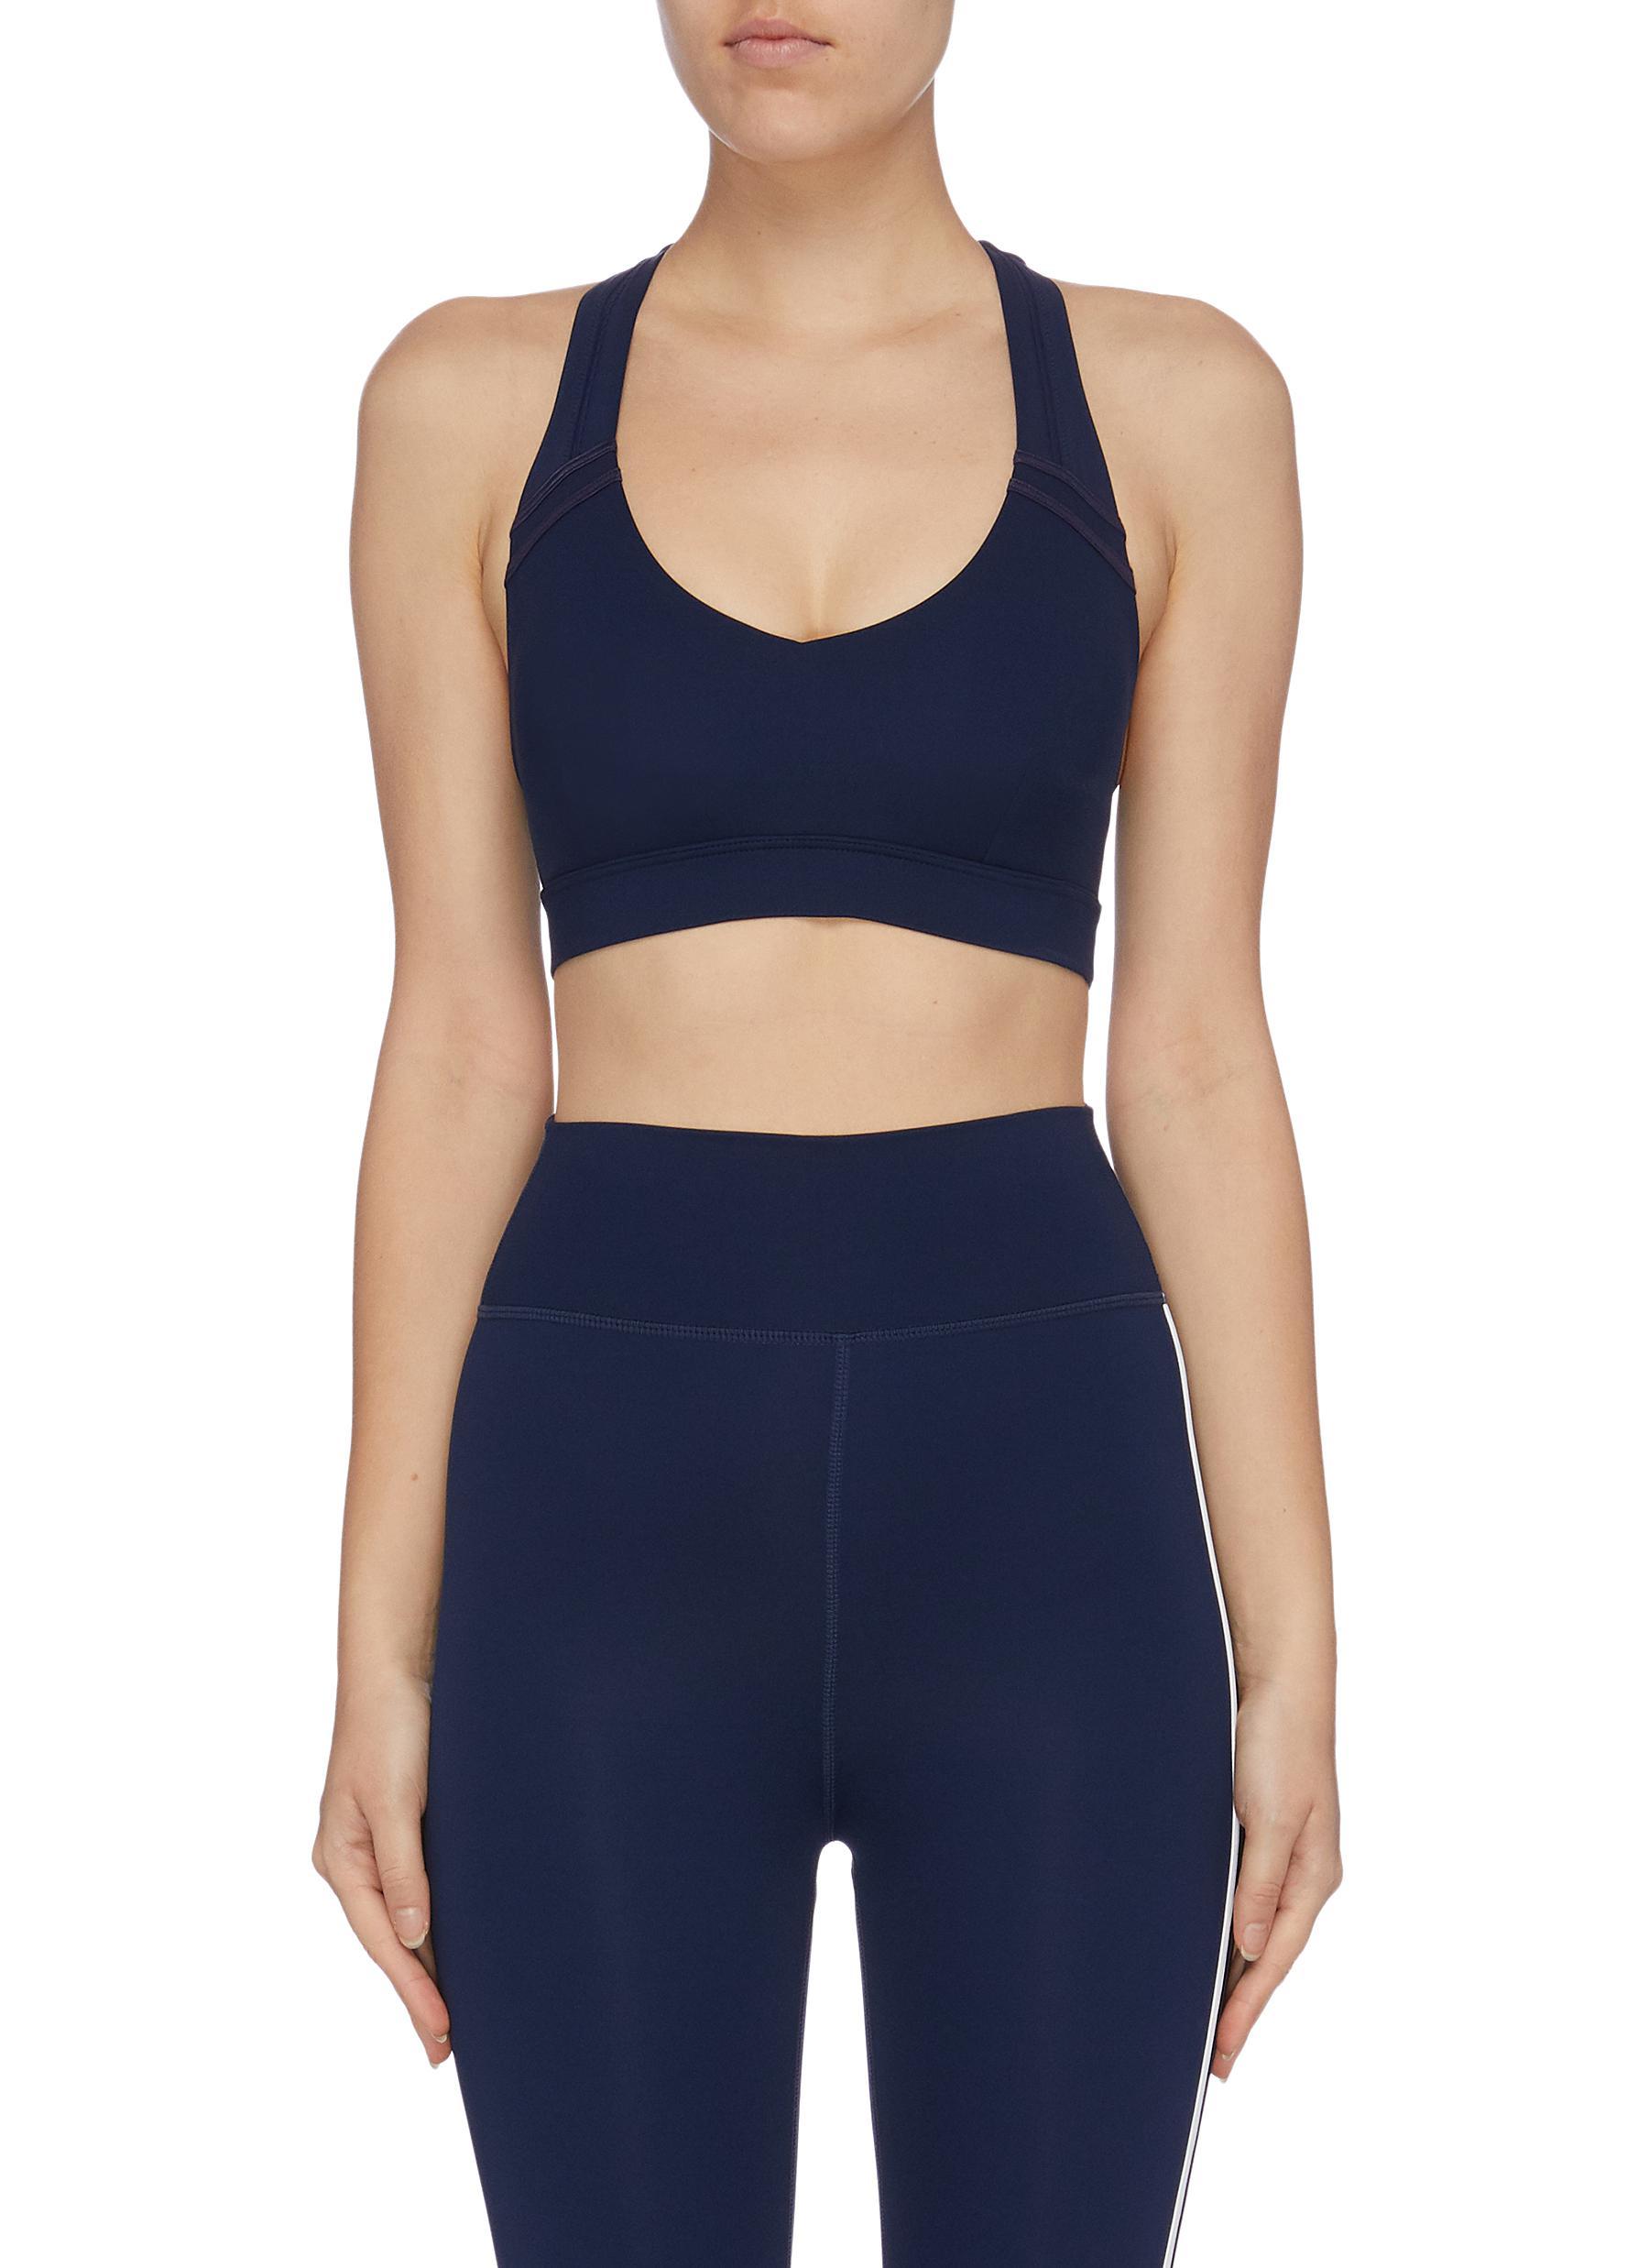 Vivi cutout back sports bra by The Upside